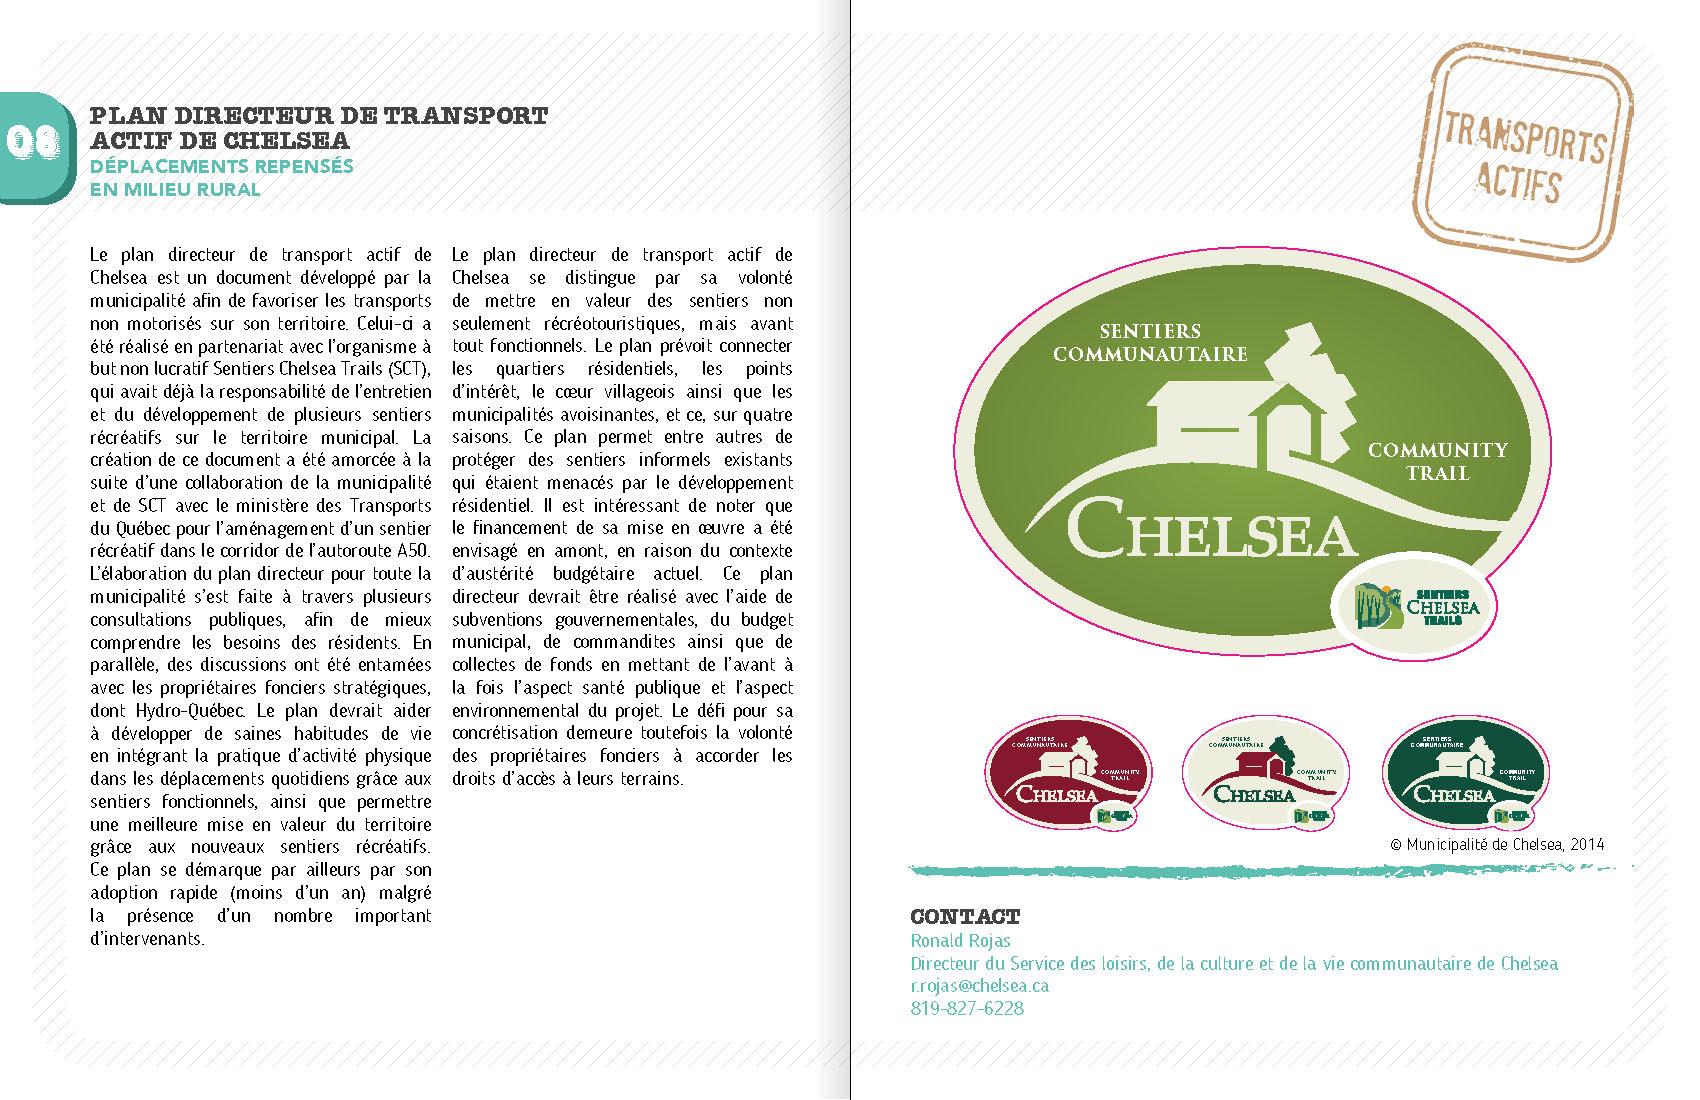 pr15-12_RRU_passeport_FINALv2_Page_11.jpg